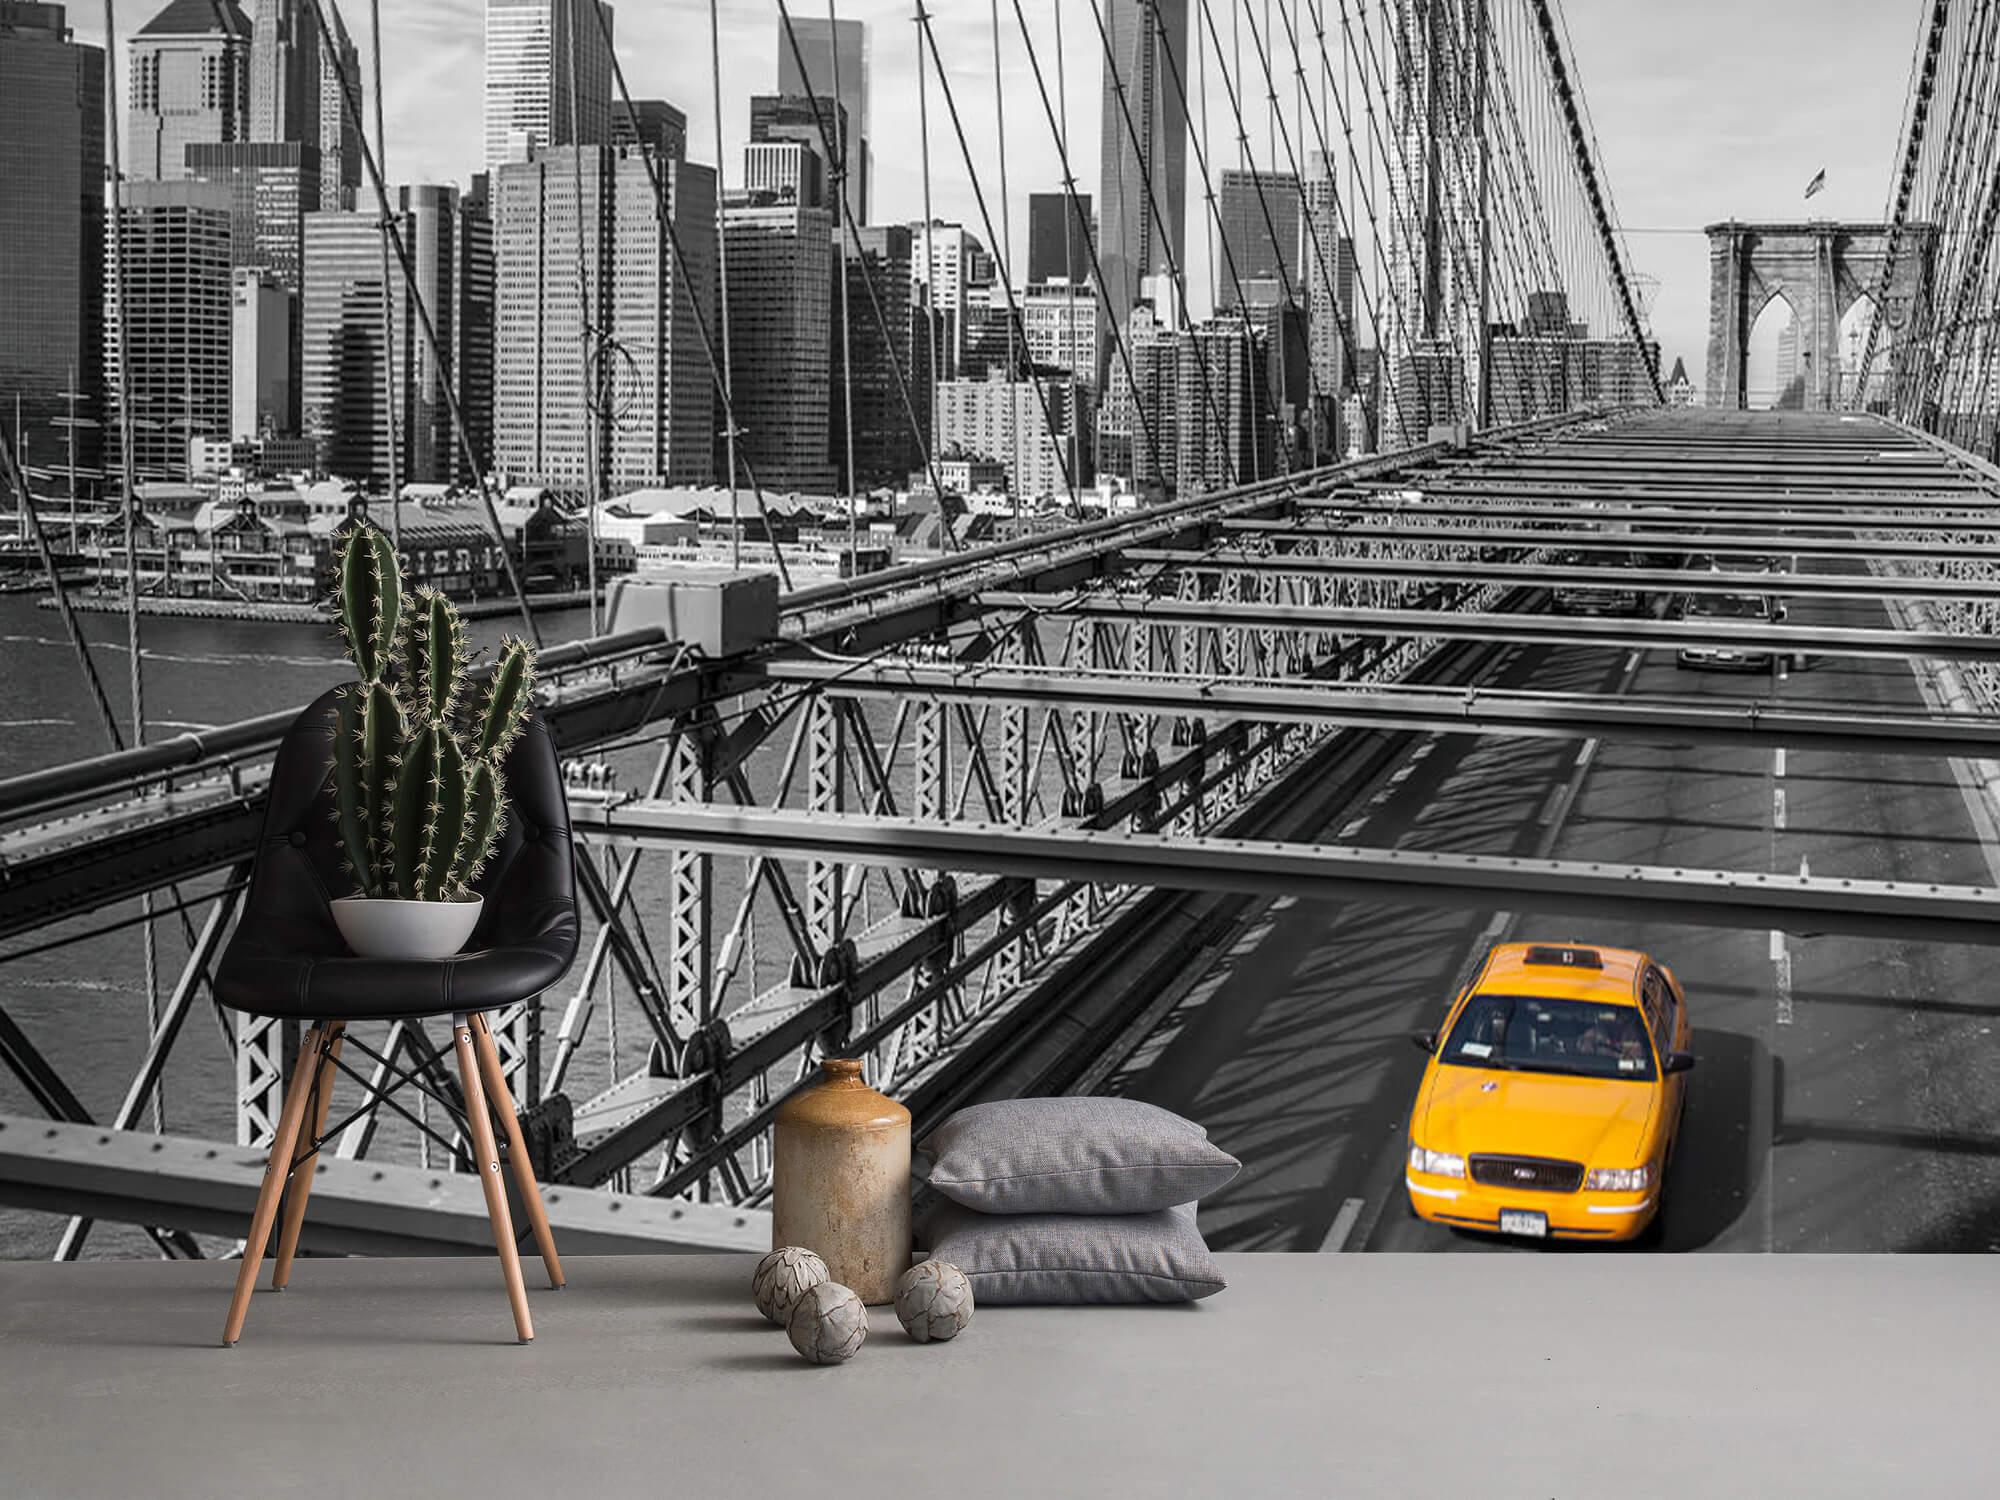 A taxi across the Brooklyn Bridge 10